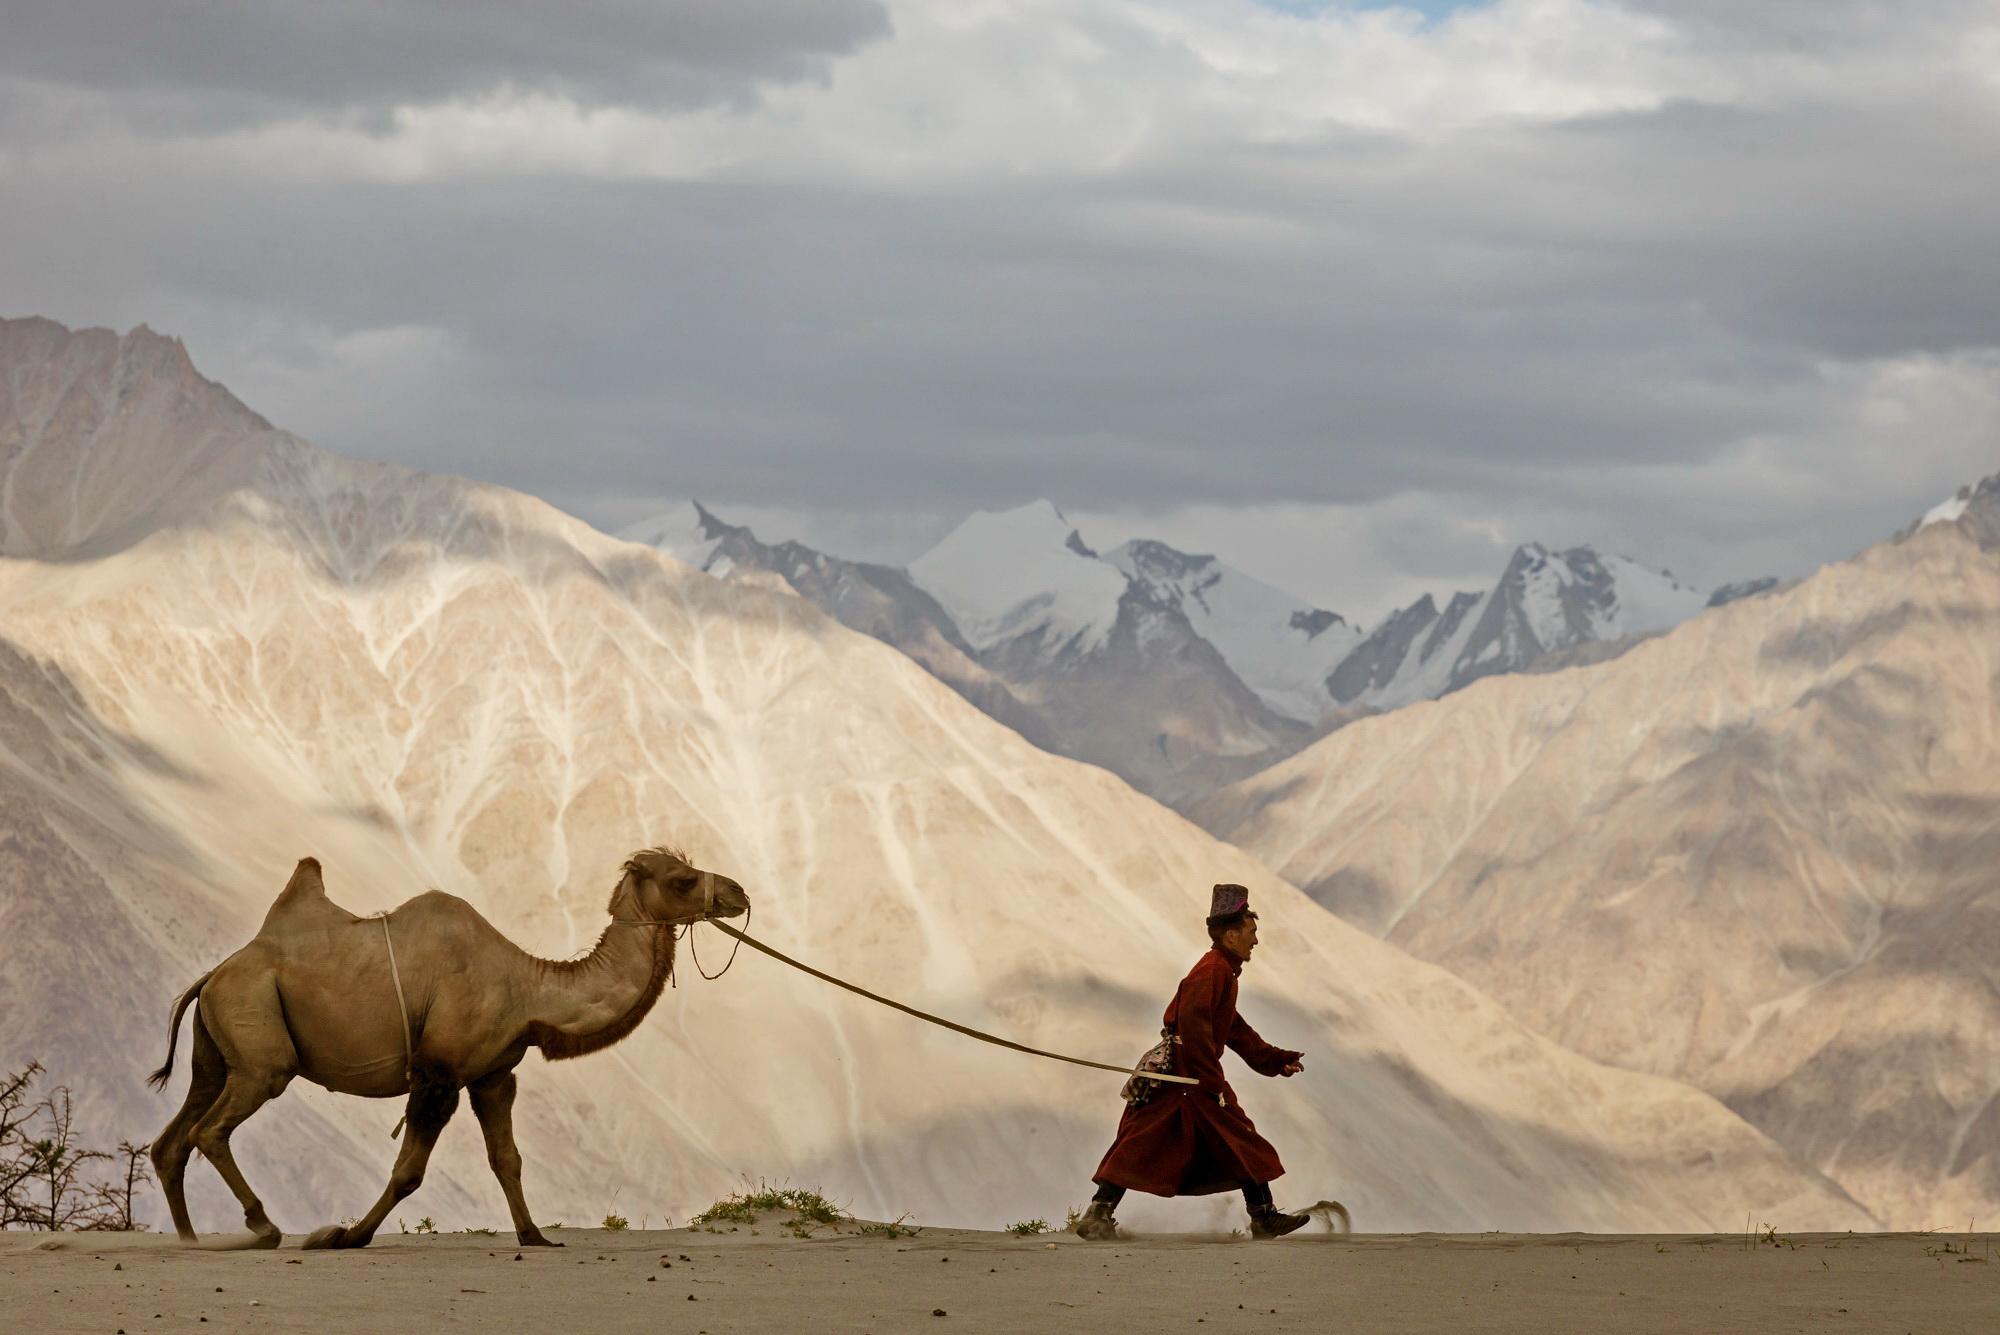 Nomad-Ladakh-Susan-Flickinger